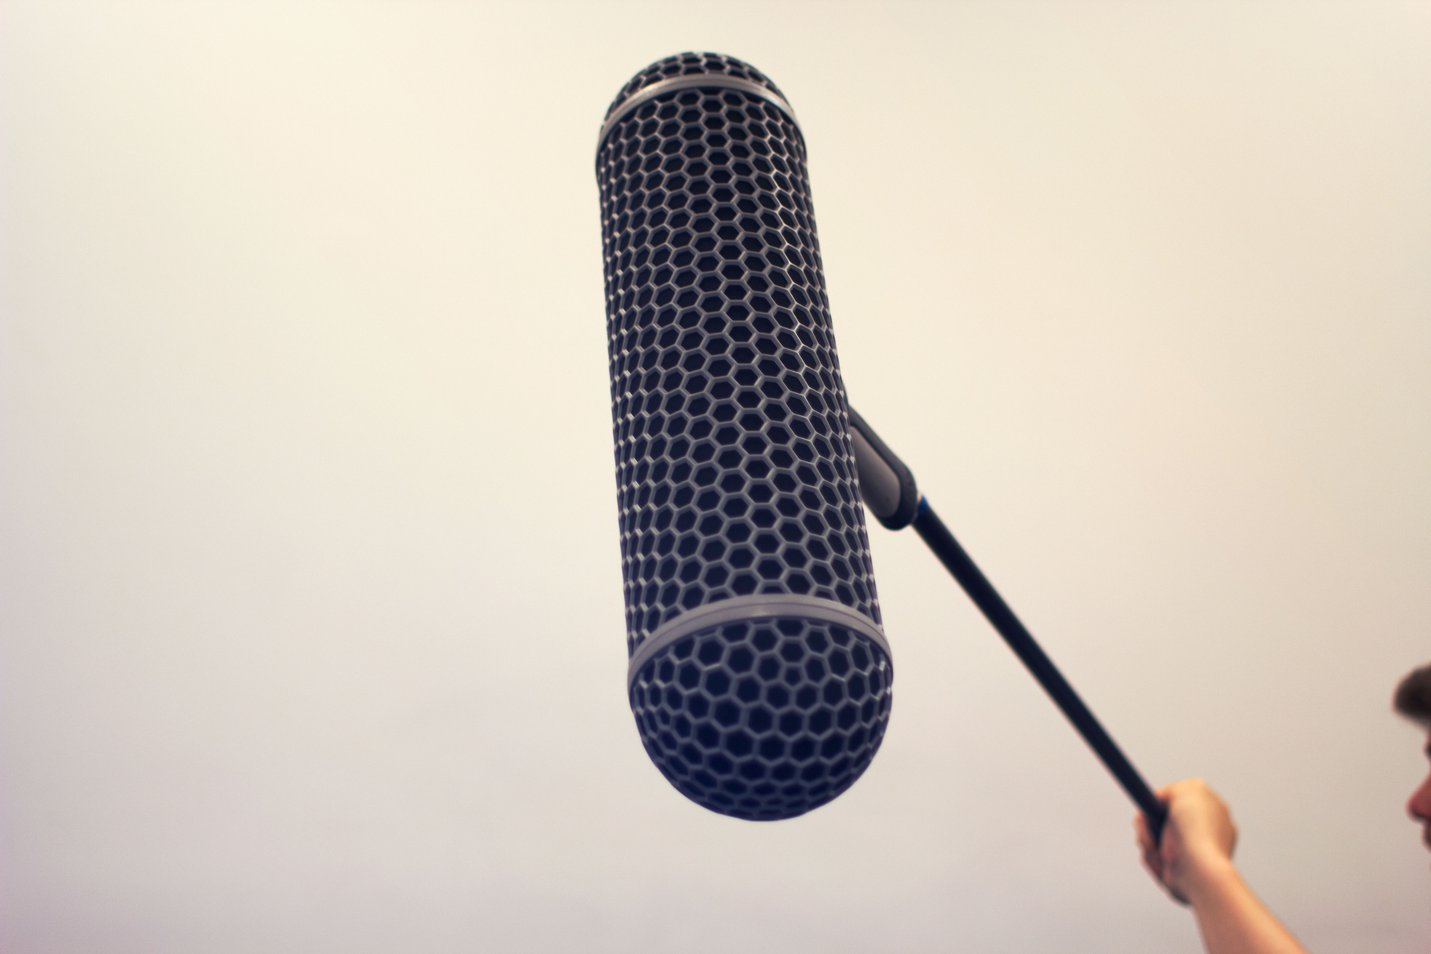 Boom microphone on pole